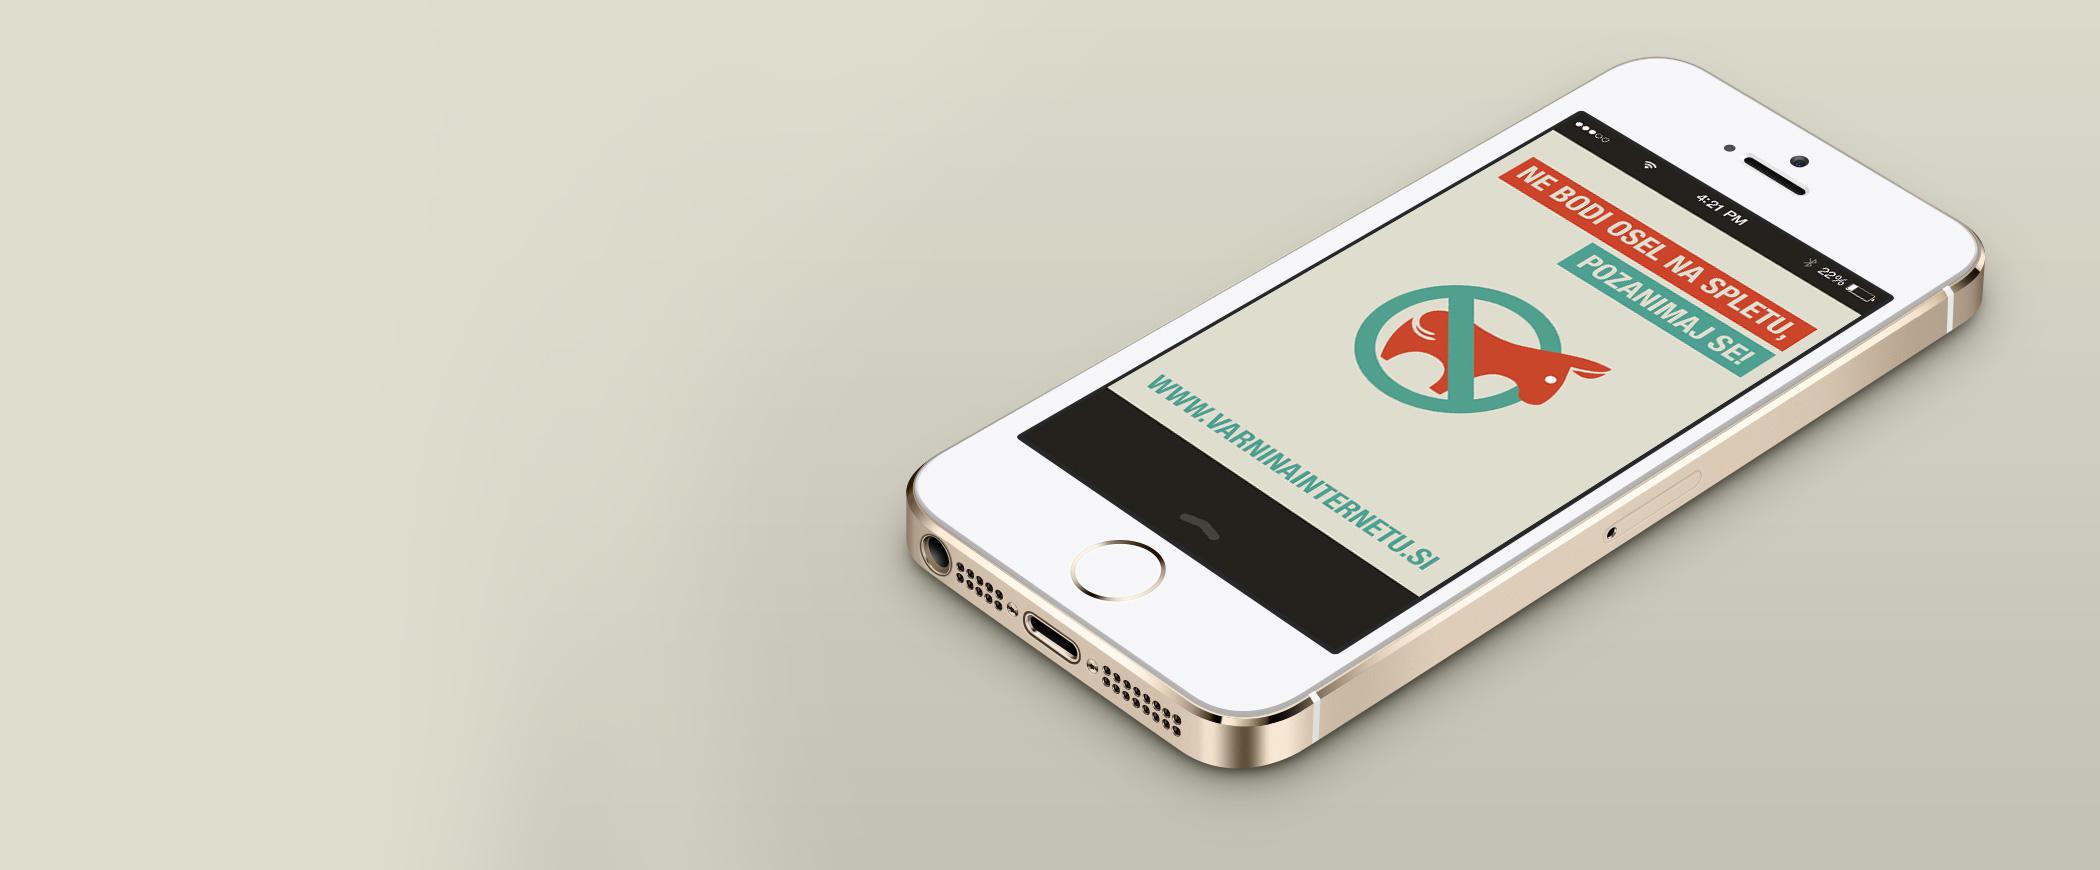 Slika pametnega telefona s sliko Varni na interneru